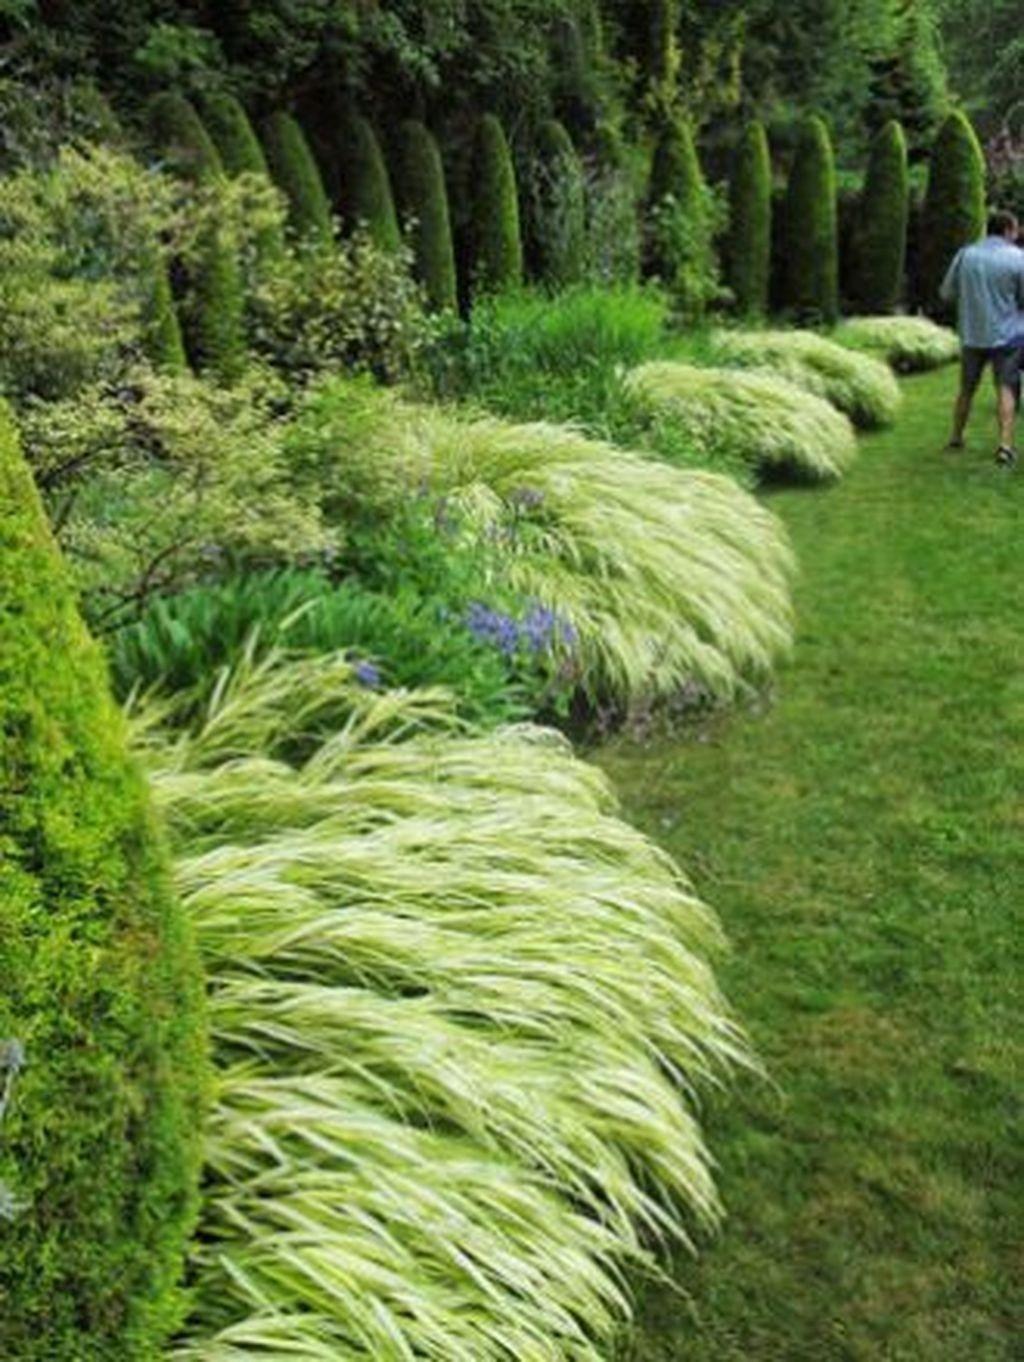 Amazing Evergreen Grasses Landscaping Ideas41 #drylandscapegarden